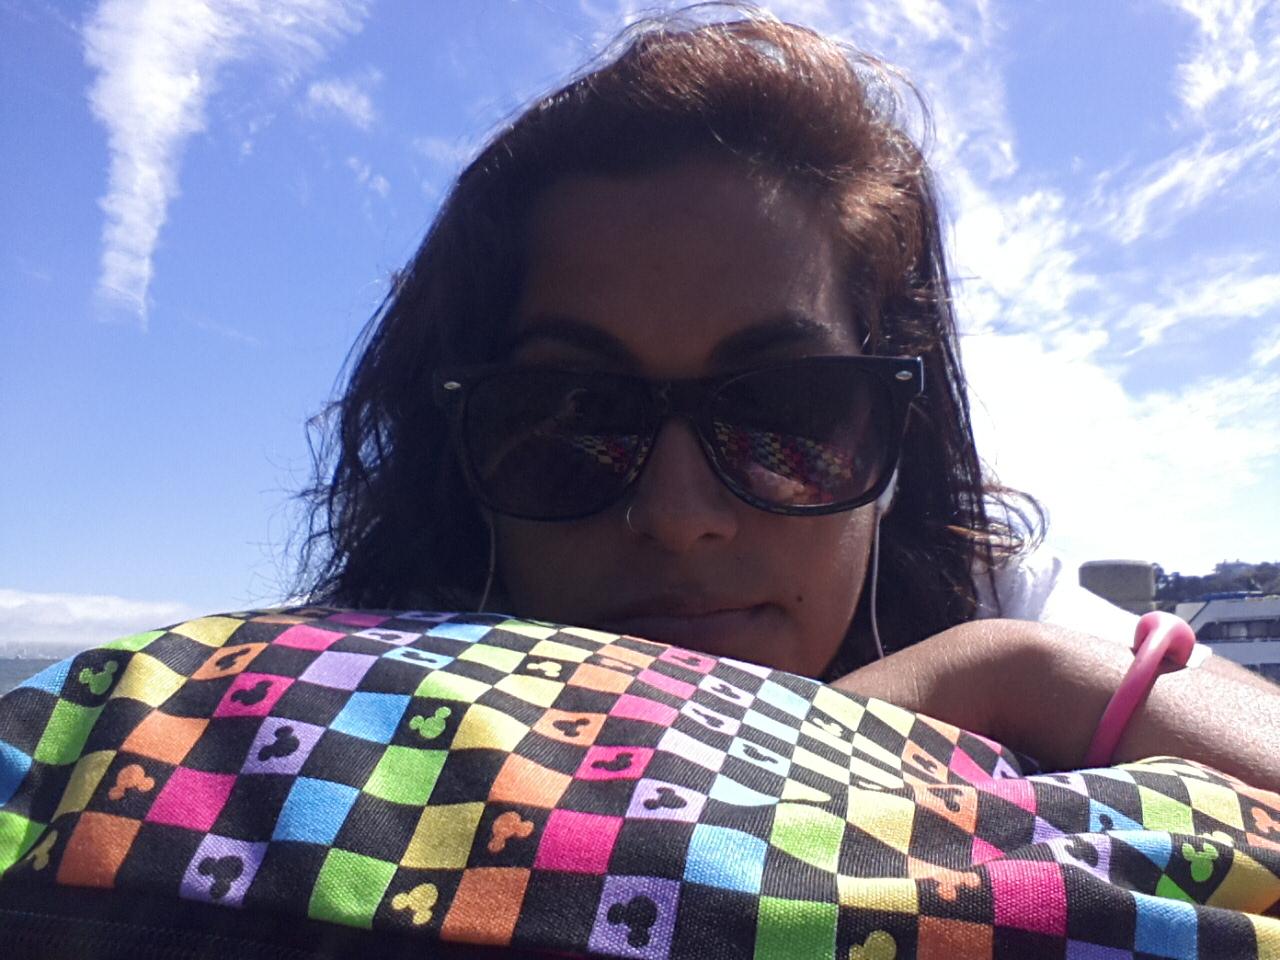 All by myself; enjoying the sun in San Fran.